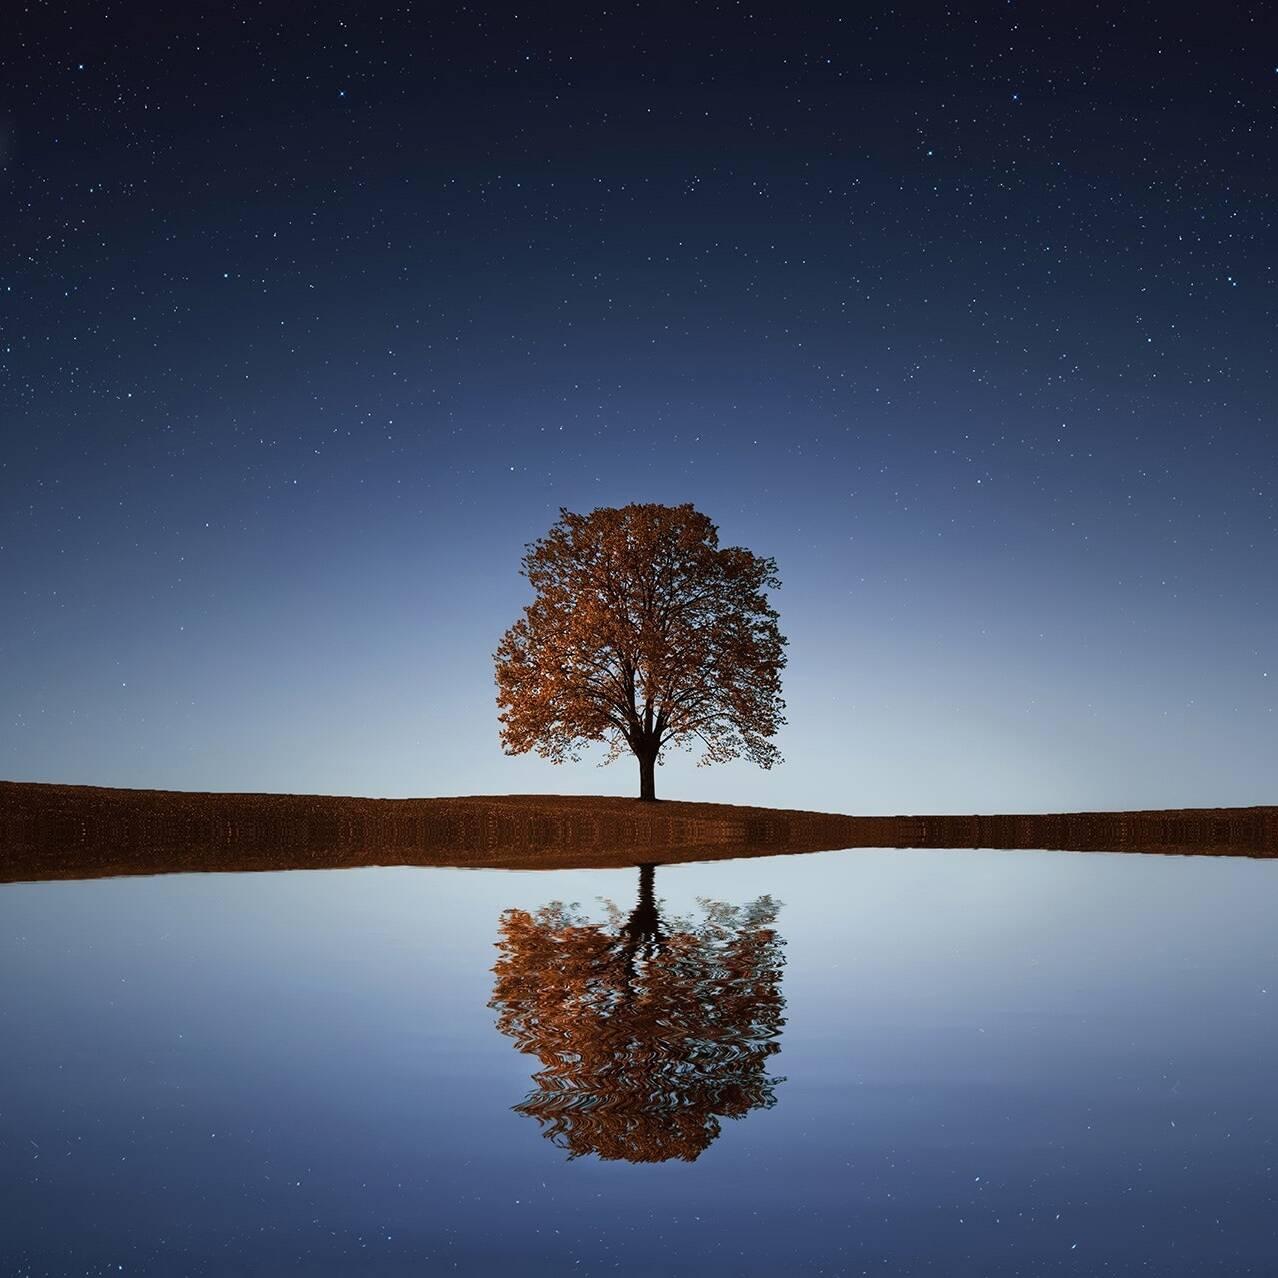 Single Tree, Nigh sky lake image with reflection